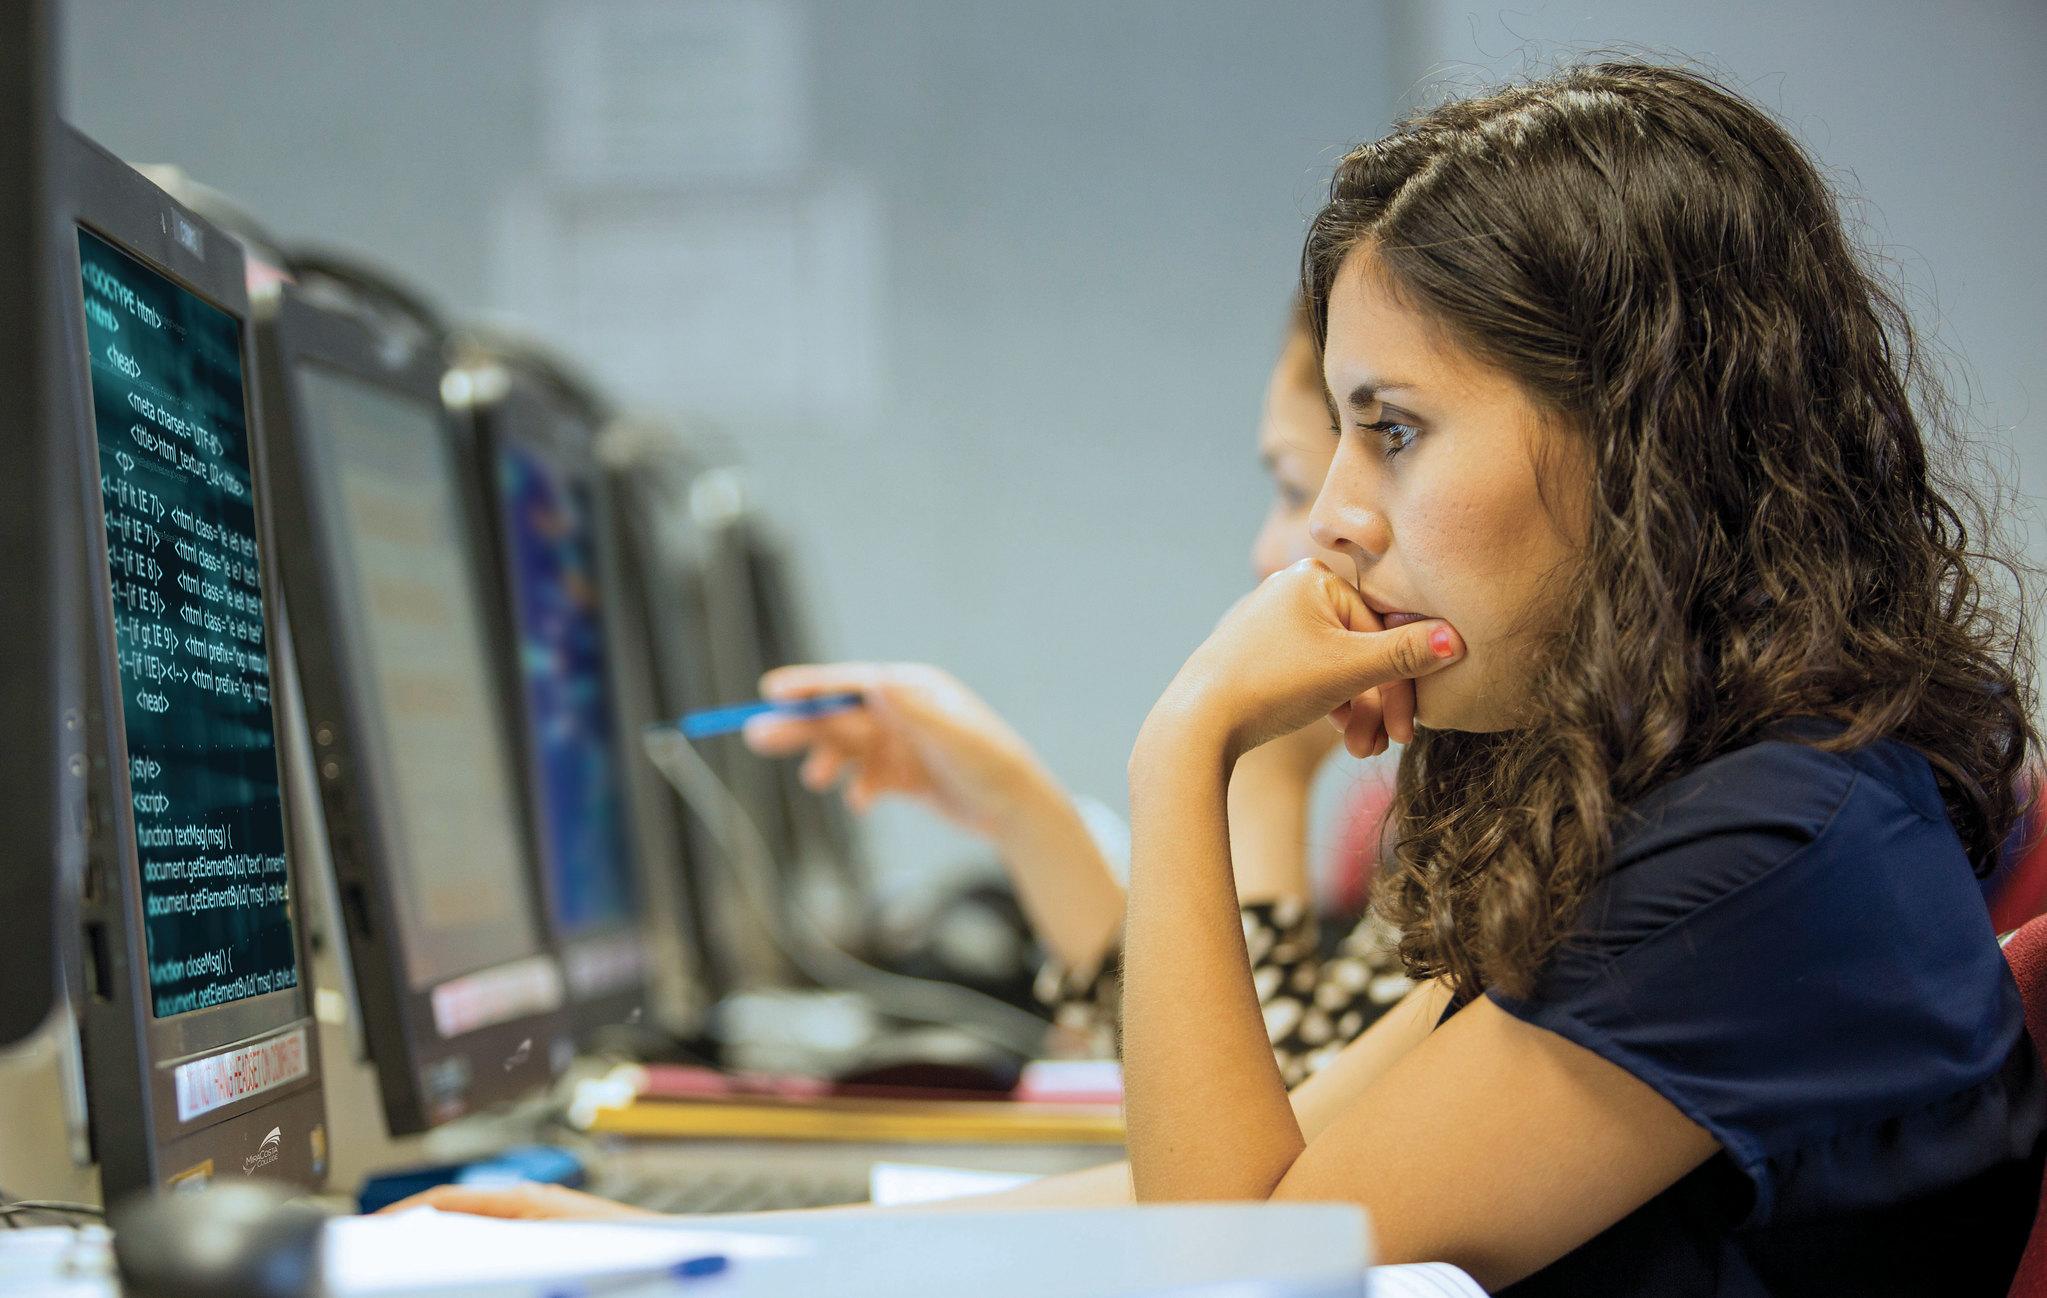 student on computer